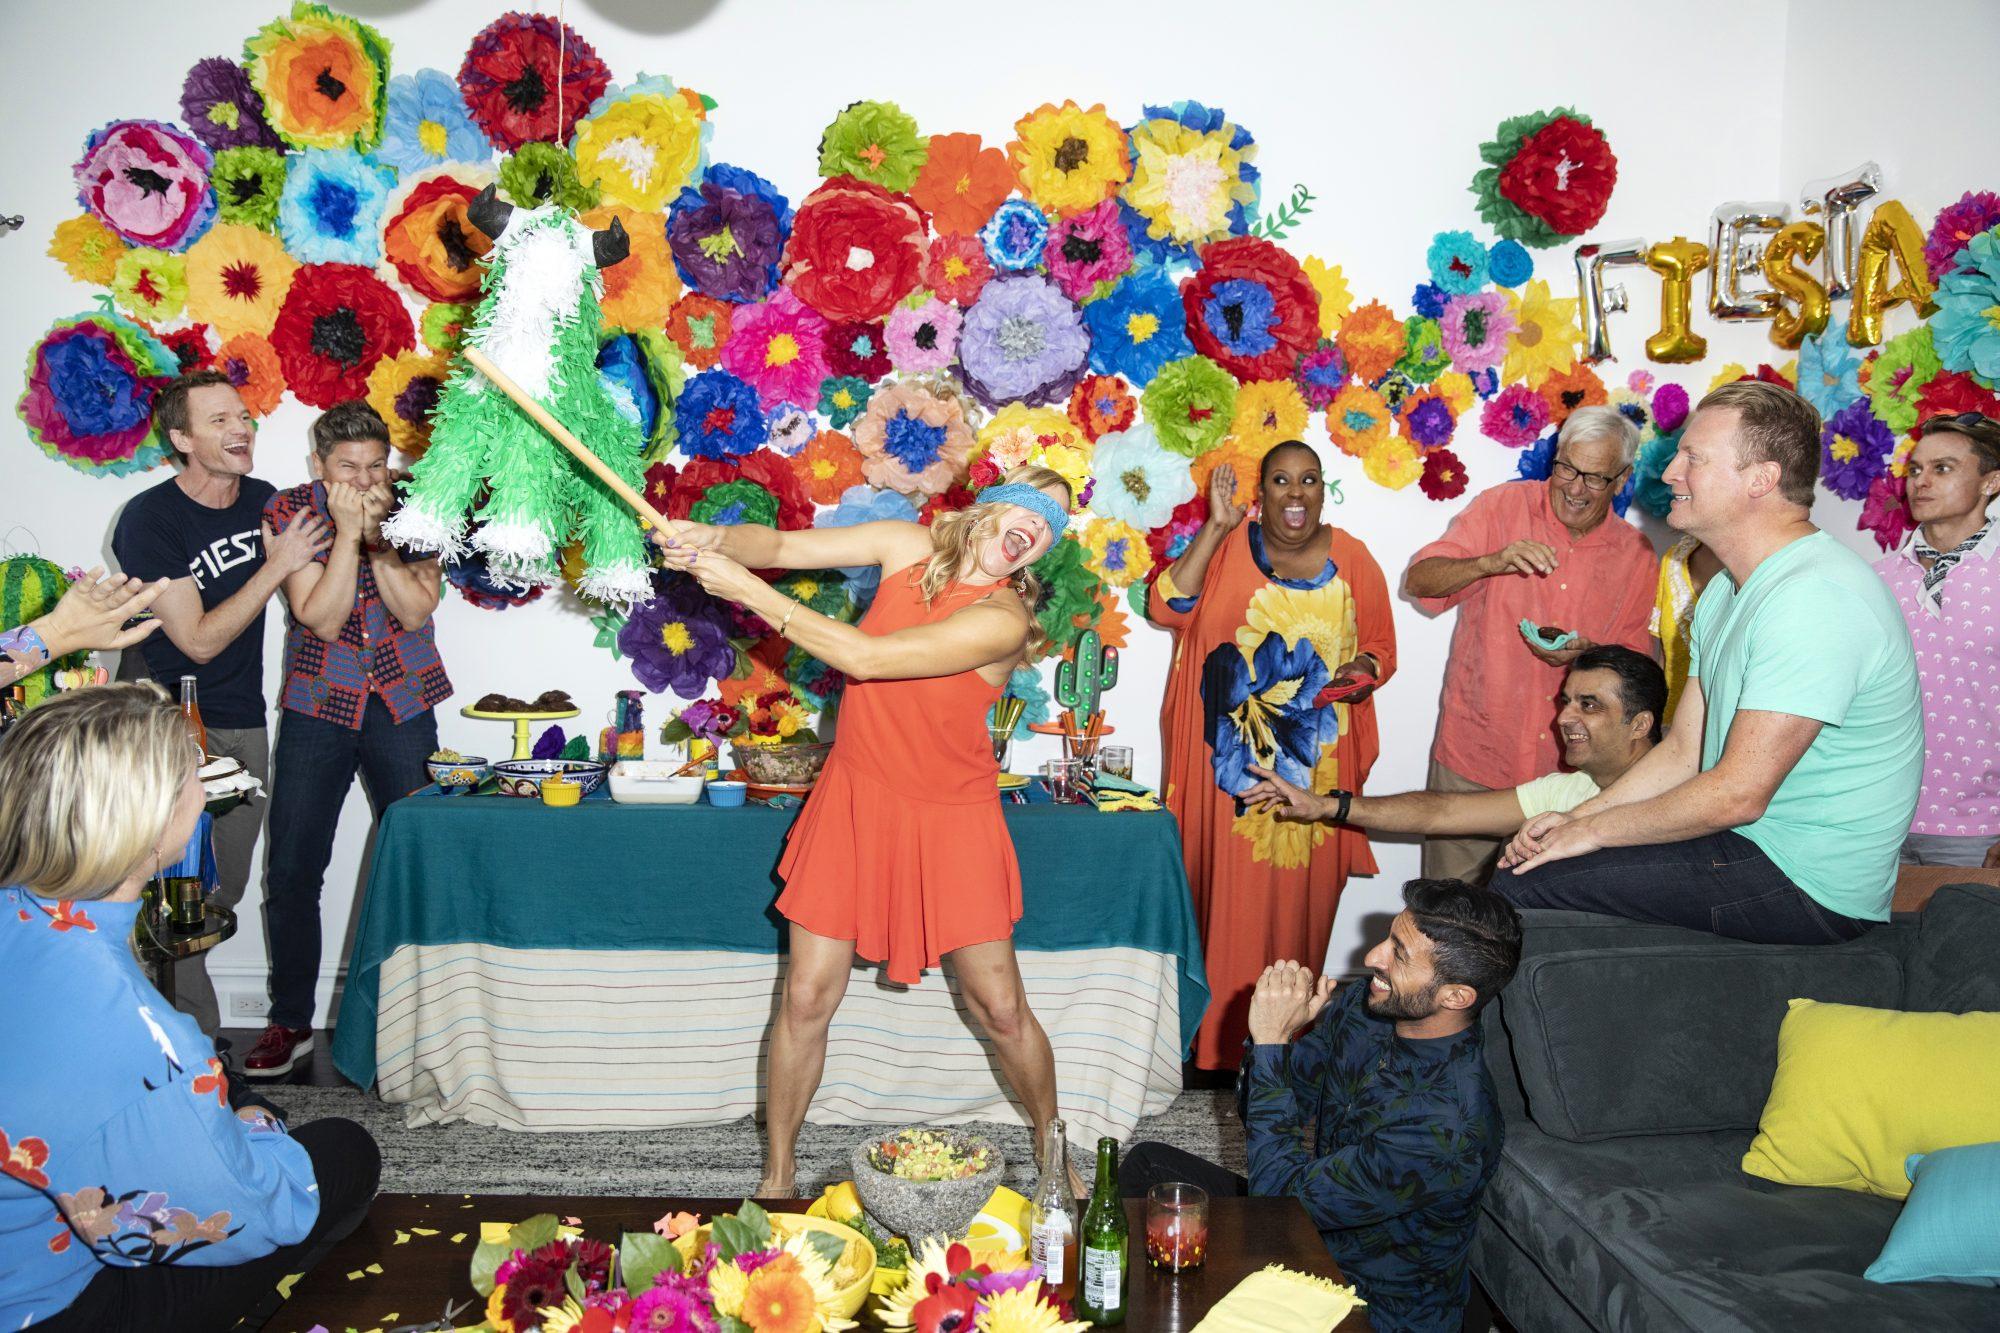 Neil Patrick Harris and David Burtka host a fiesta party